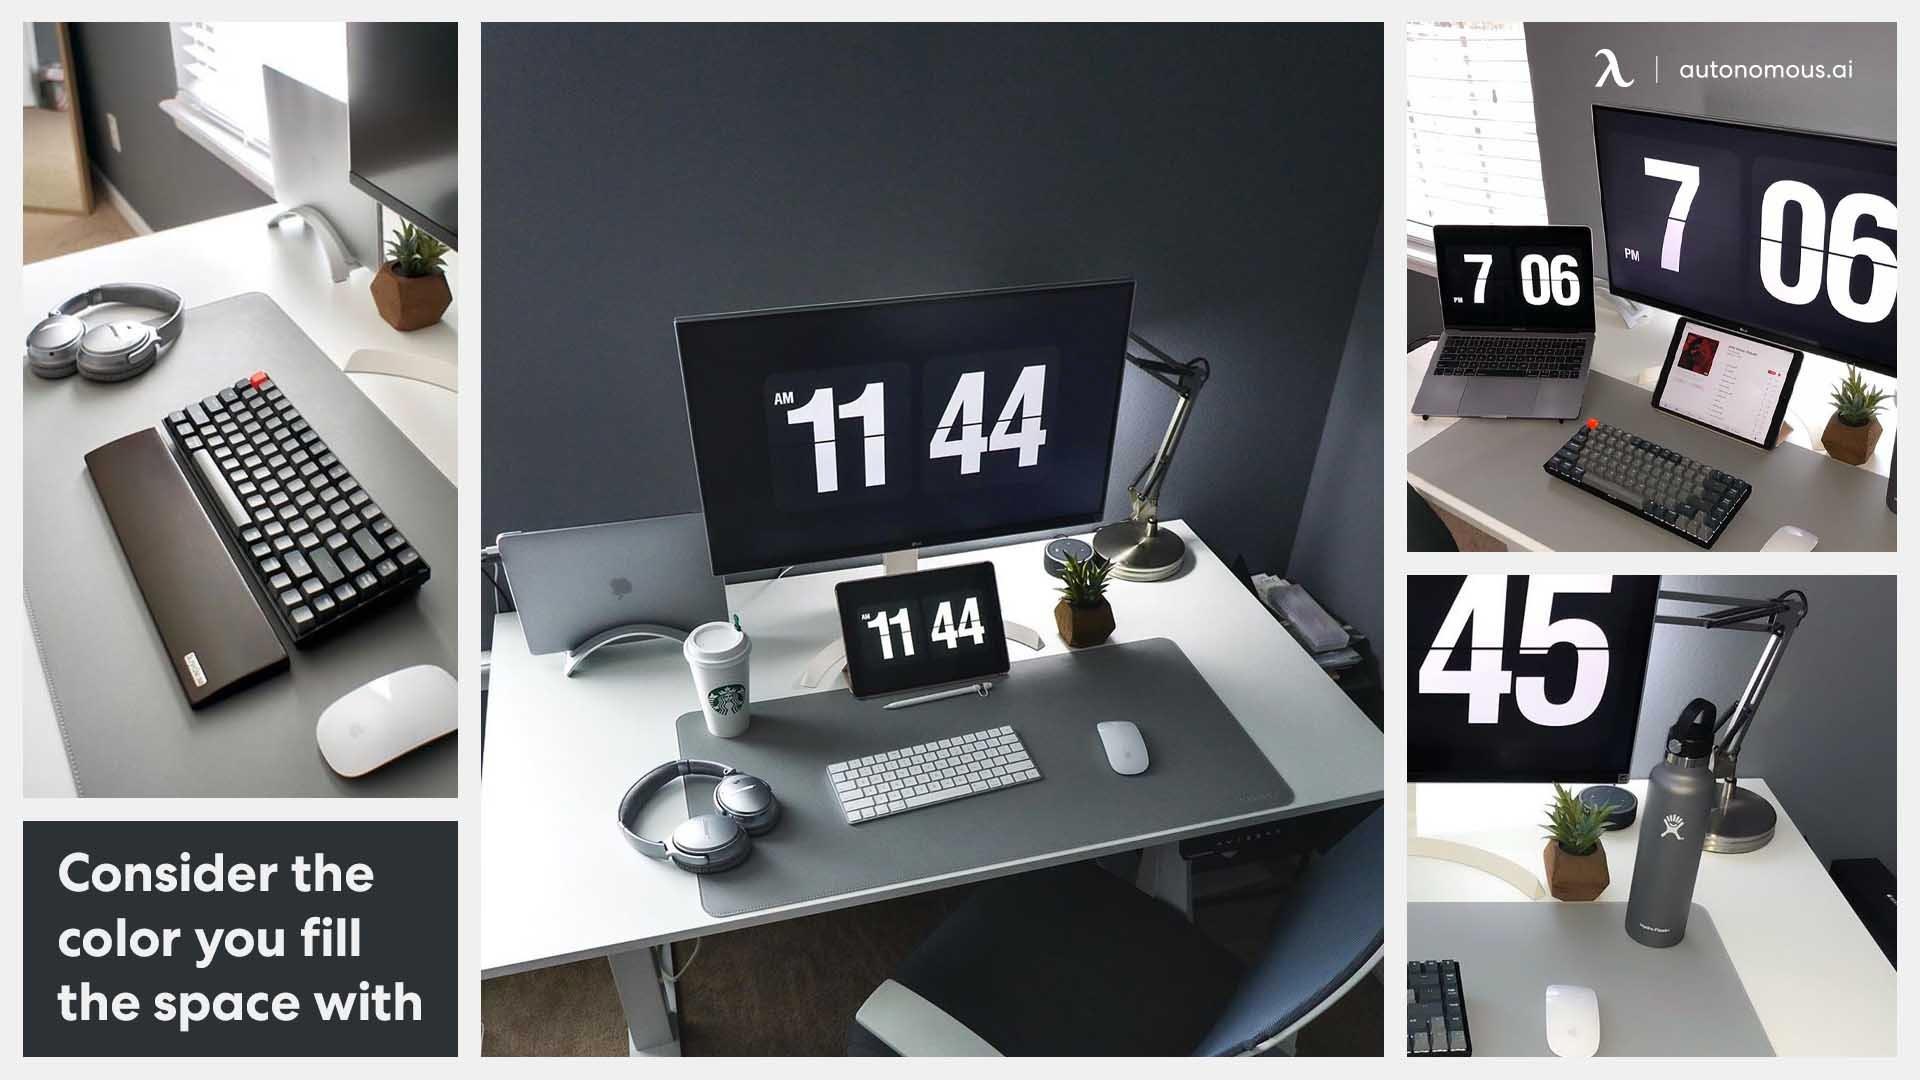 Desk setup with bright color